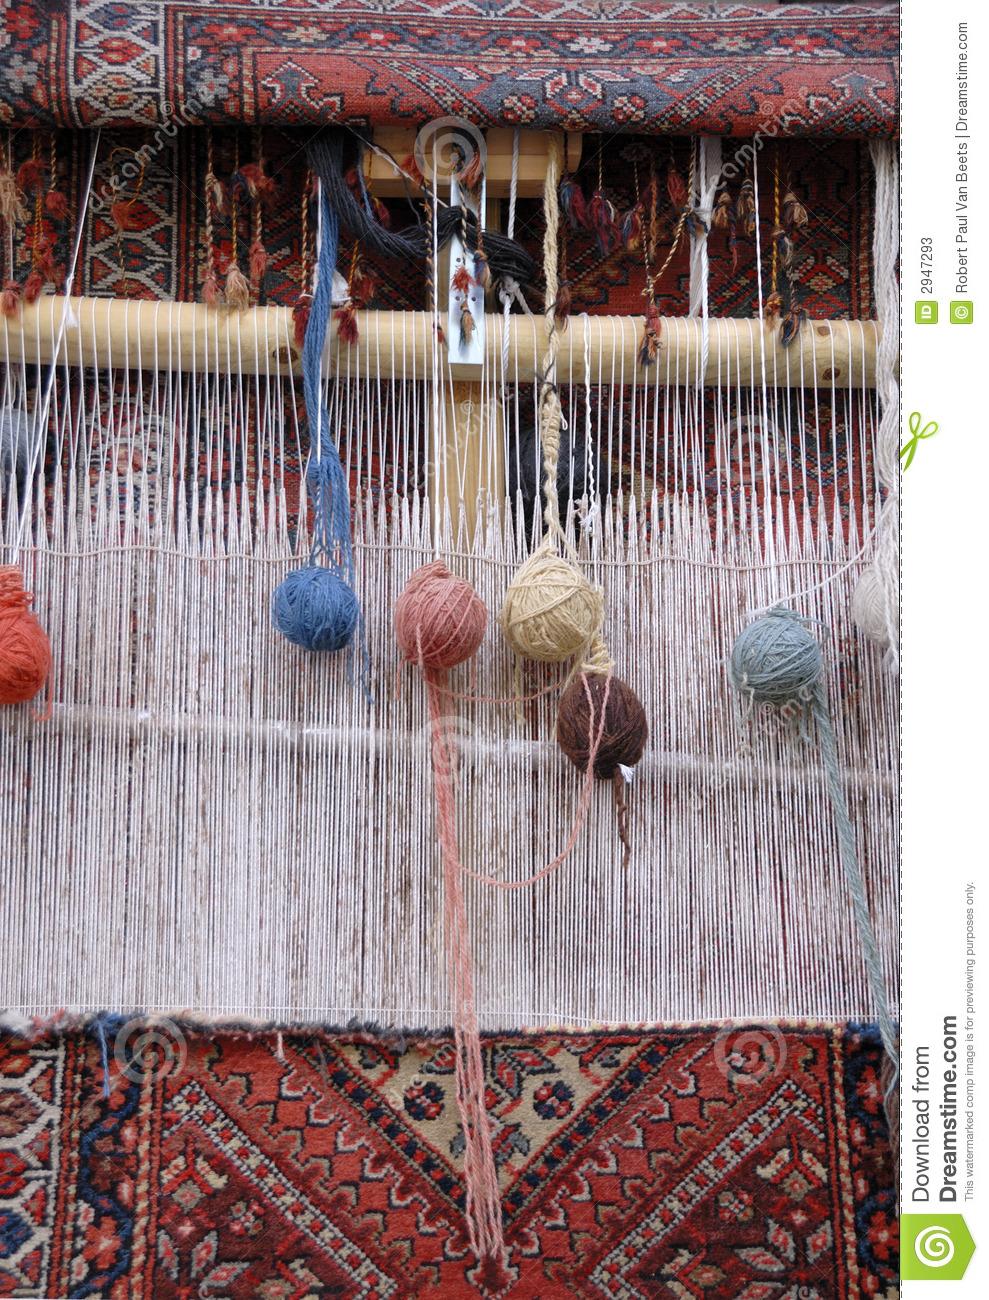 Carpet Weaving Loom Stock Photos.